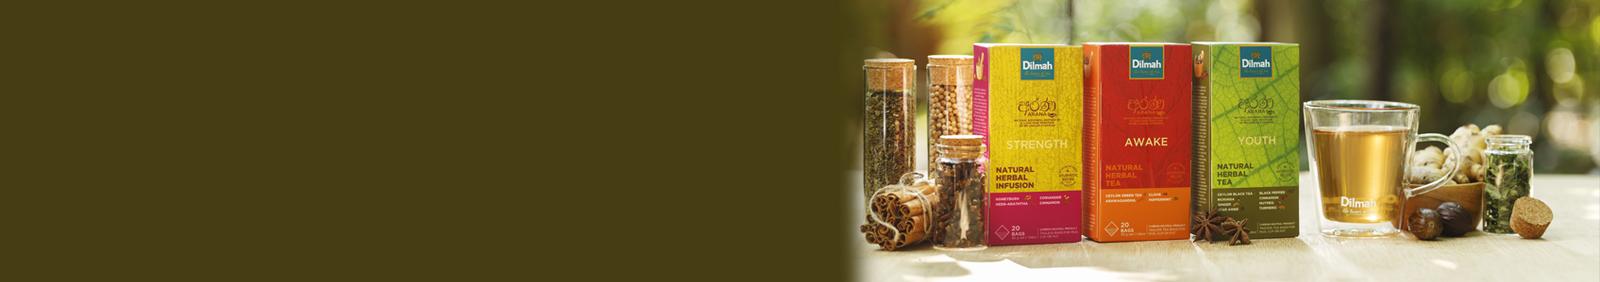 Arana Herbal Tea & Infusions